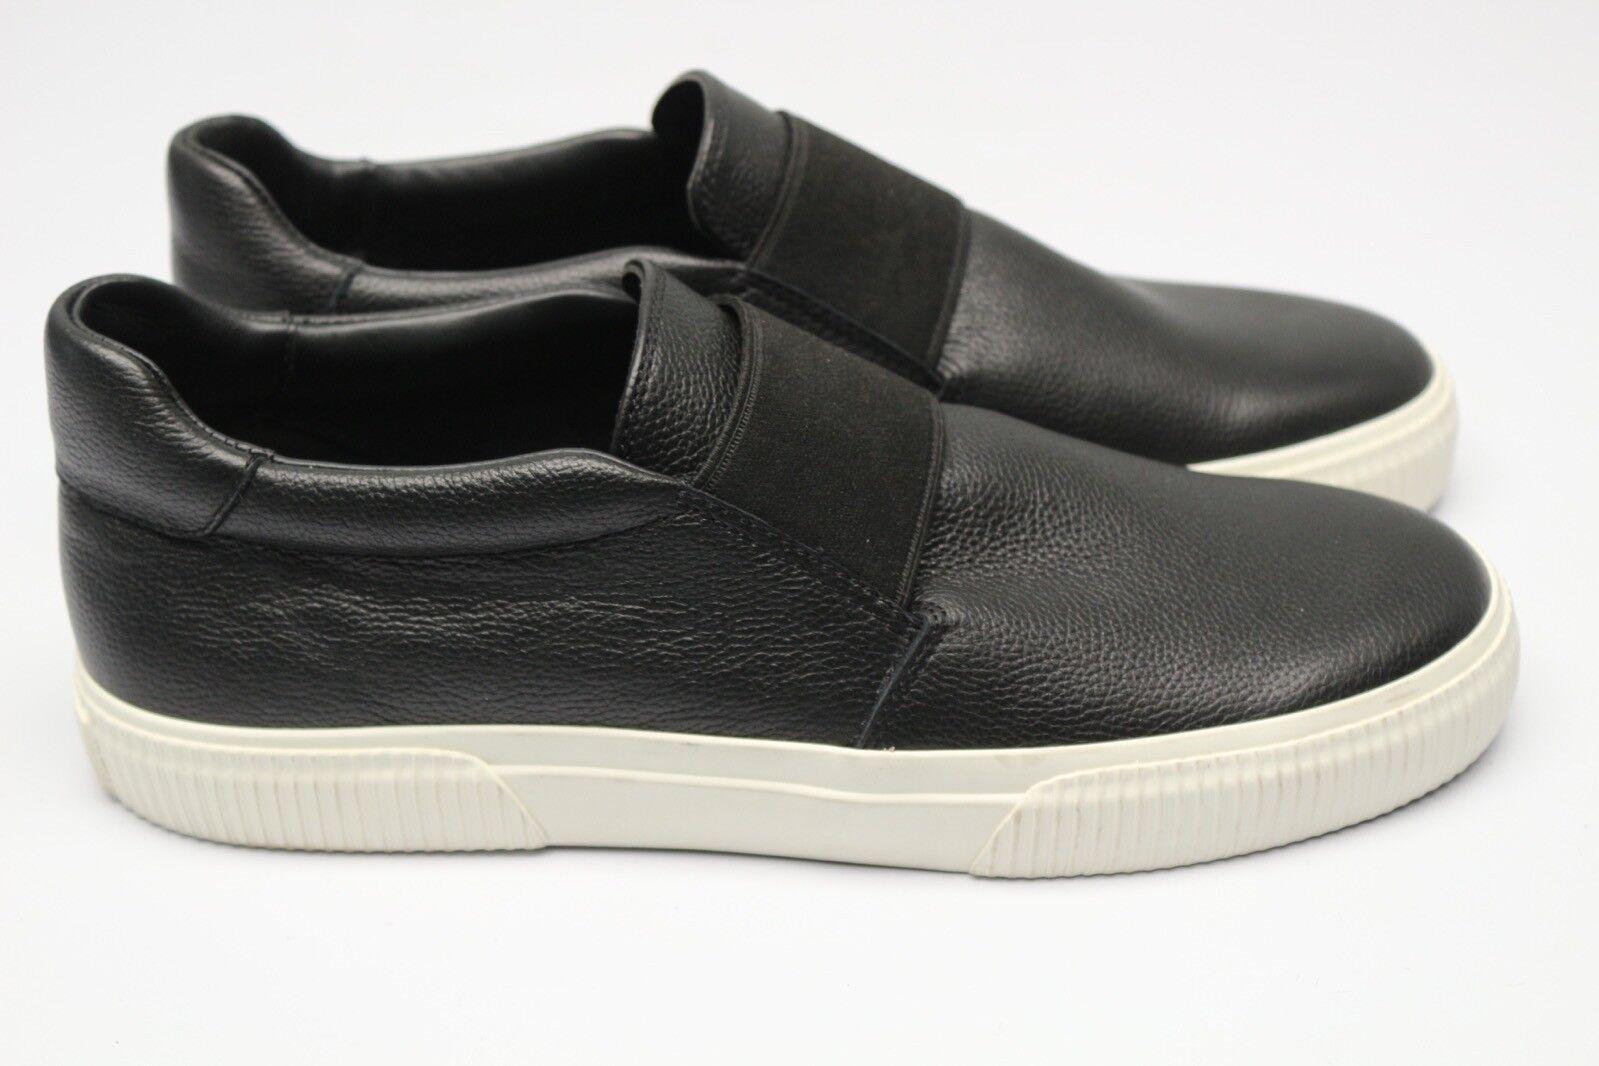 NWOB Vince. Weiß Kirkland Leder Sneaker 9.5 M 39.5 Schwarz Weiß Vince. Niedrig Slipper Neu acfaac